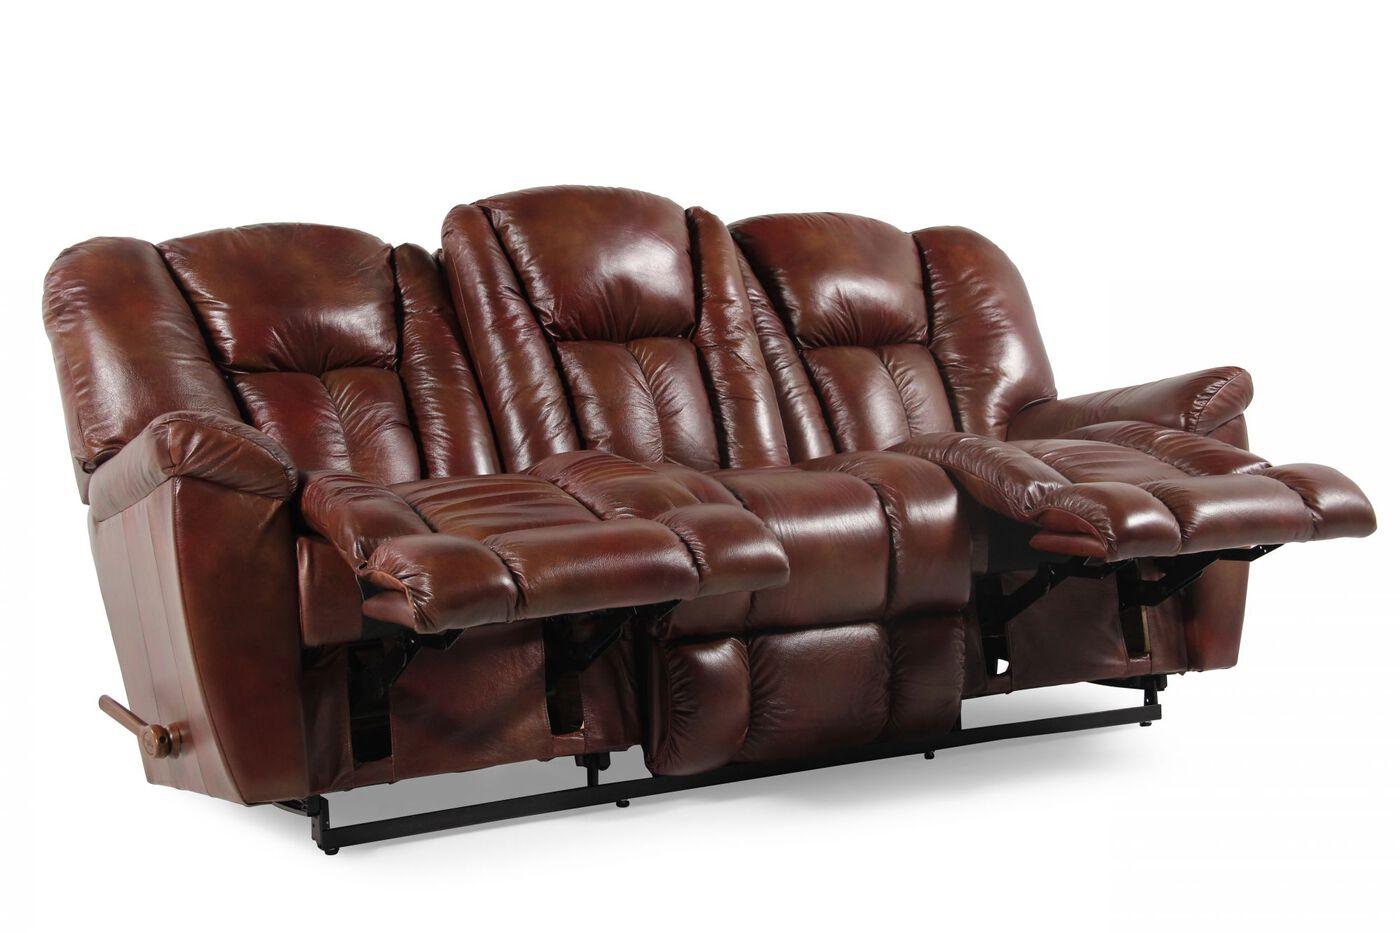 LaZBoy Maverick Mahogany Reclining Sofa Mathis Brothers Furniture - Mahogany leather sofa